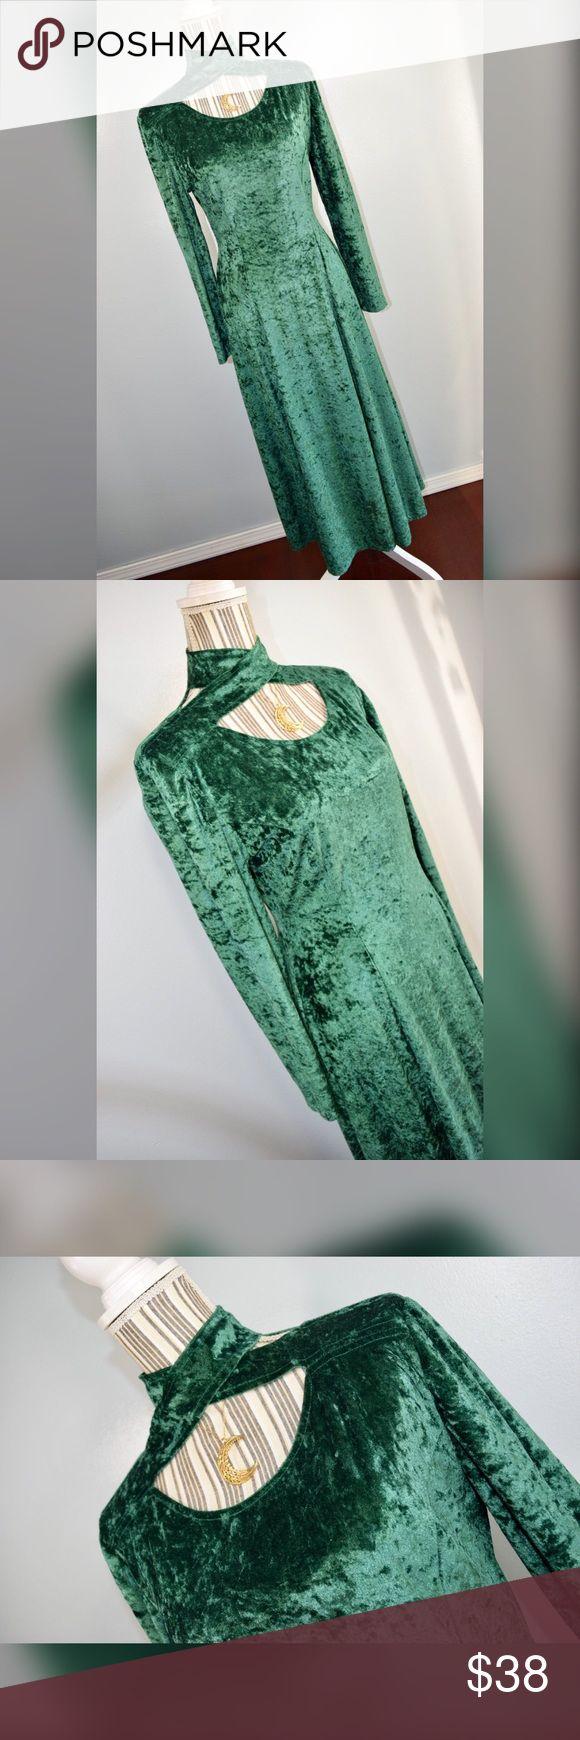 "{vintage 90s scarlett} Green Velvet Maxi Dress Vintage 90s green velvet maxi dress with cross cross collar by Scarlett. Size 7-8.   Closure: Zipper in the back  Material: 85% Polyester 15% Lycra   Measurements  Bust: 34"" lying flat, stretches to 38""  Waist: 28"" lying flat, stretches to 34""  Hips: 50""  Shoulder to Hem Length: 50""  Sleeve Length: 23"" Scarlett Dresses Maxi"